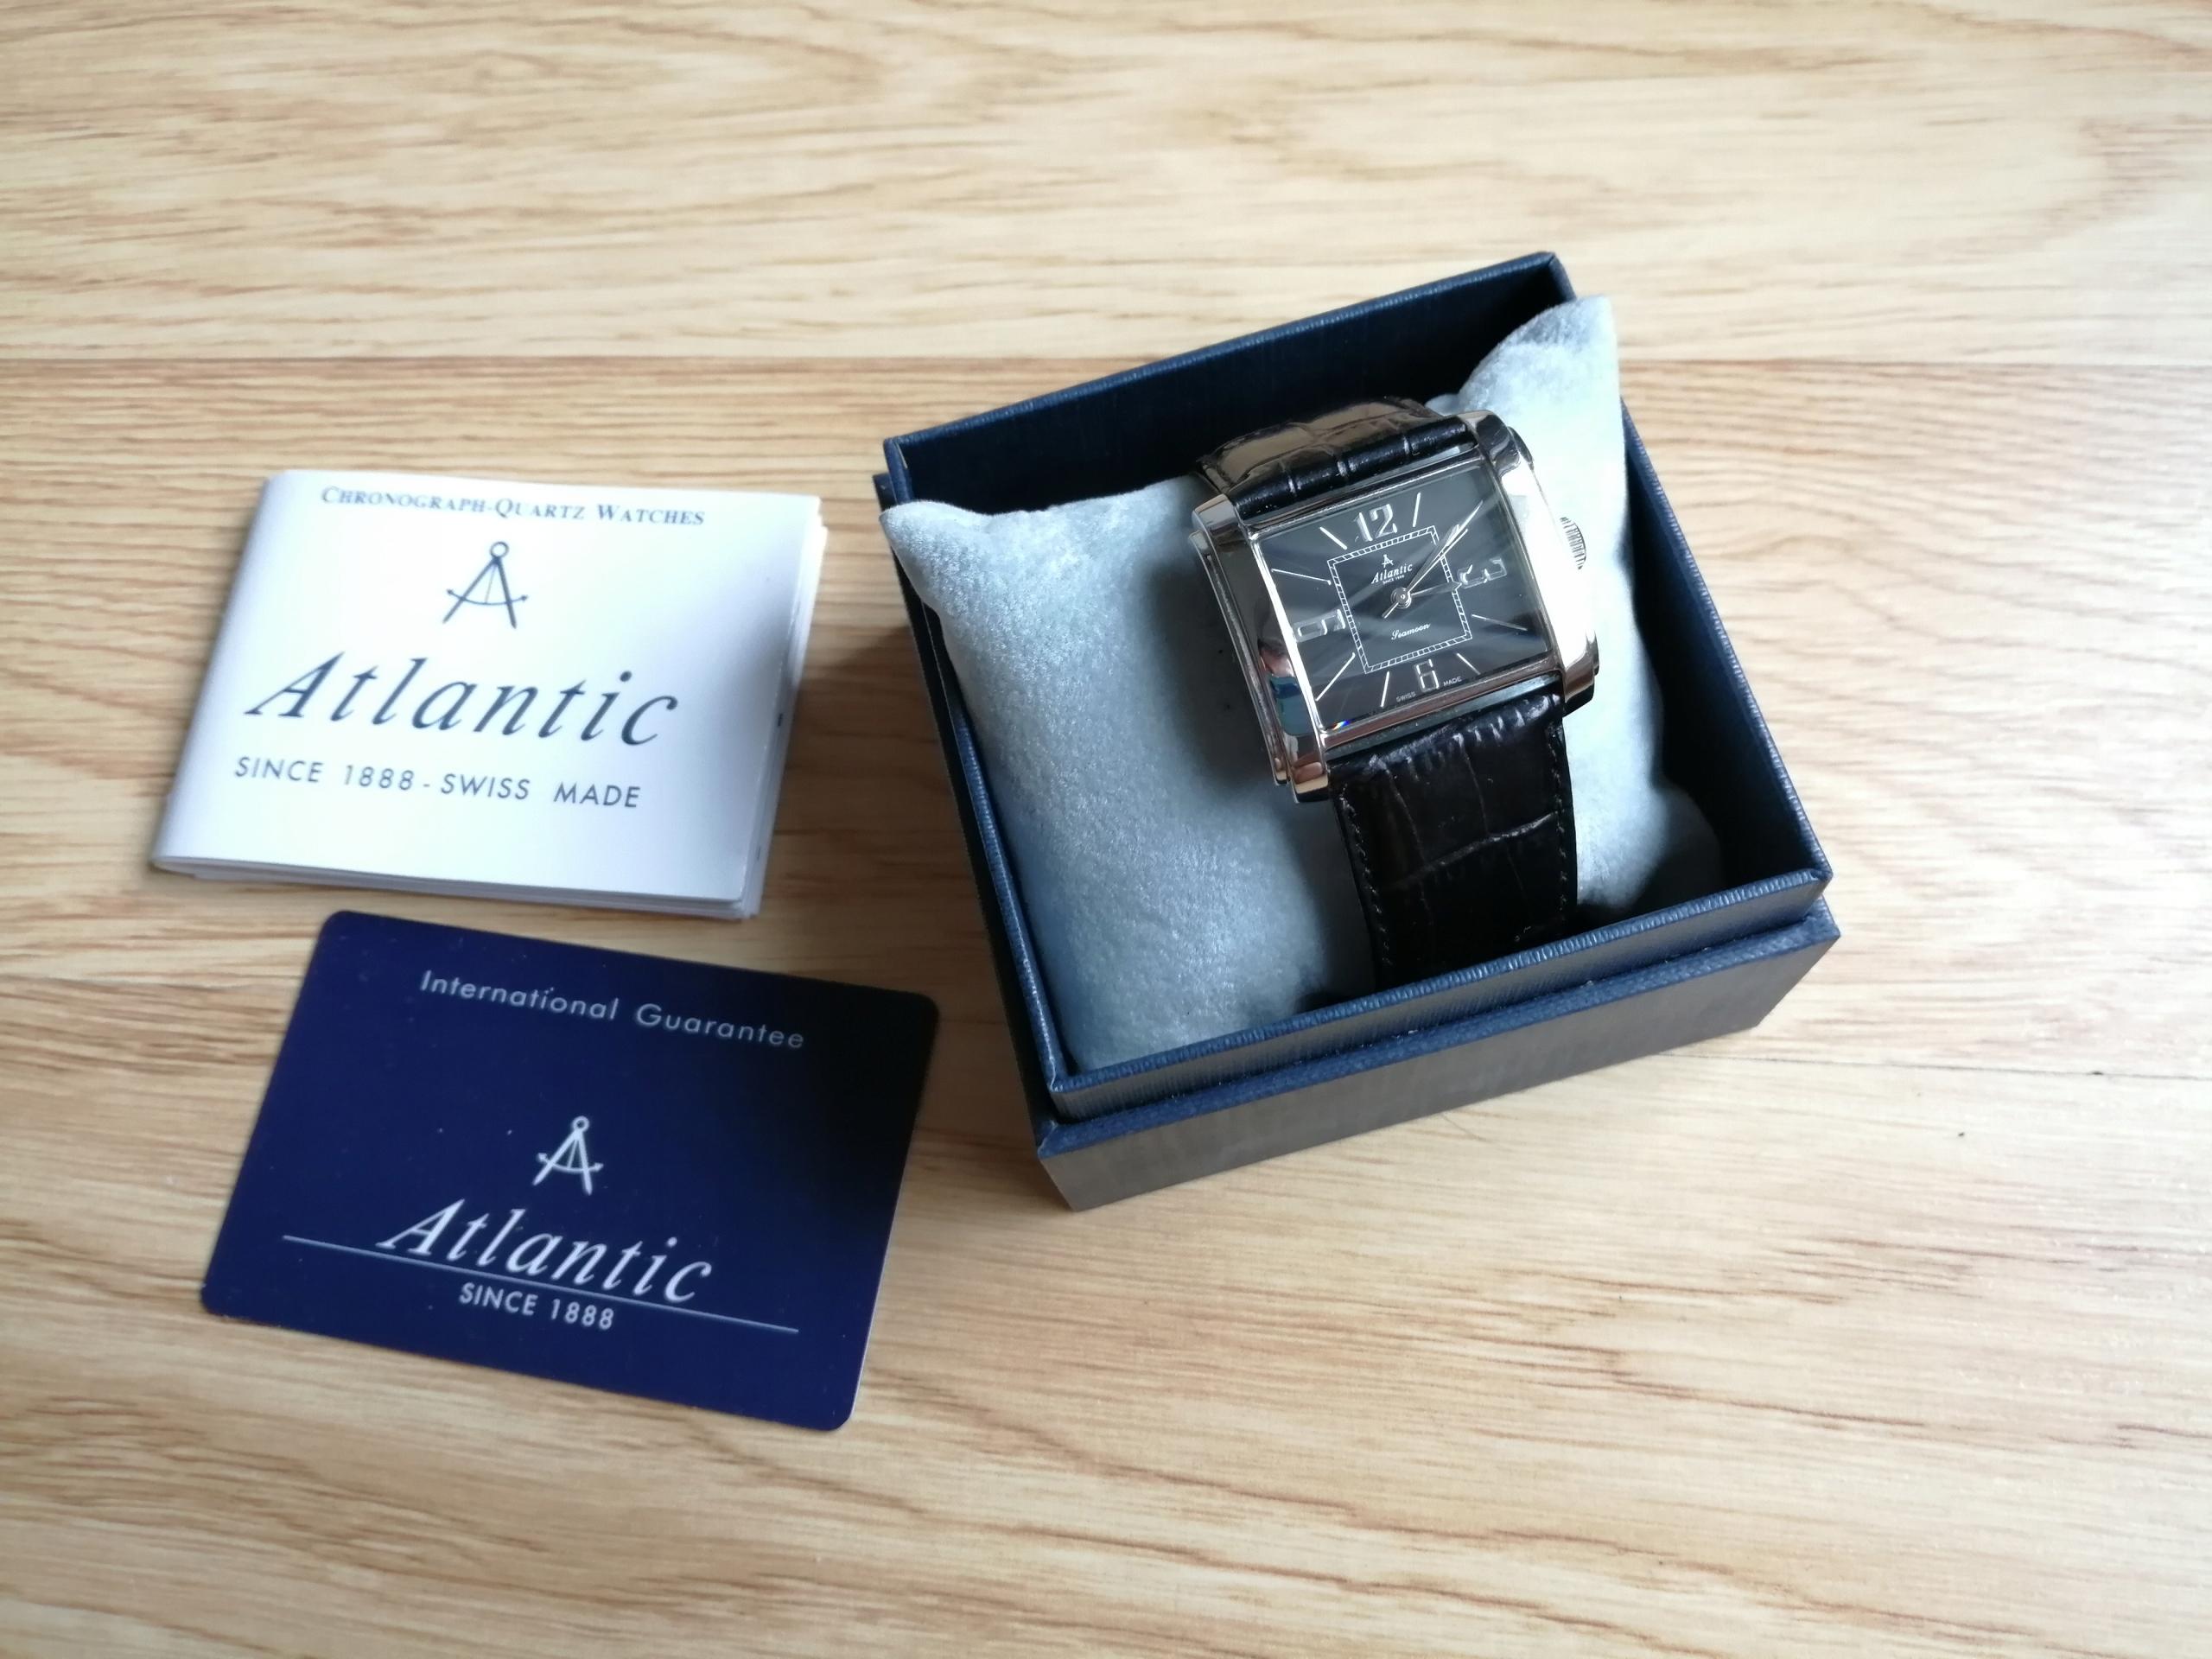 zegarek ATLANTIC Seamoon damski (JAK NOWY)